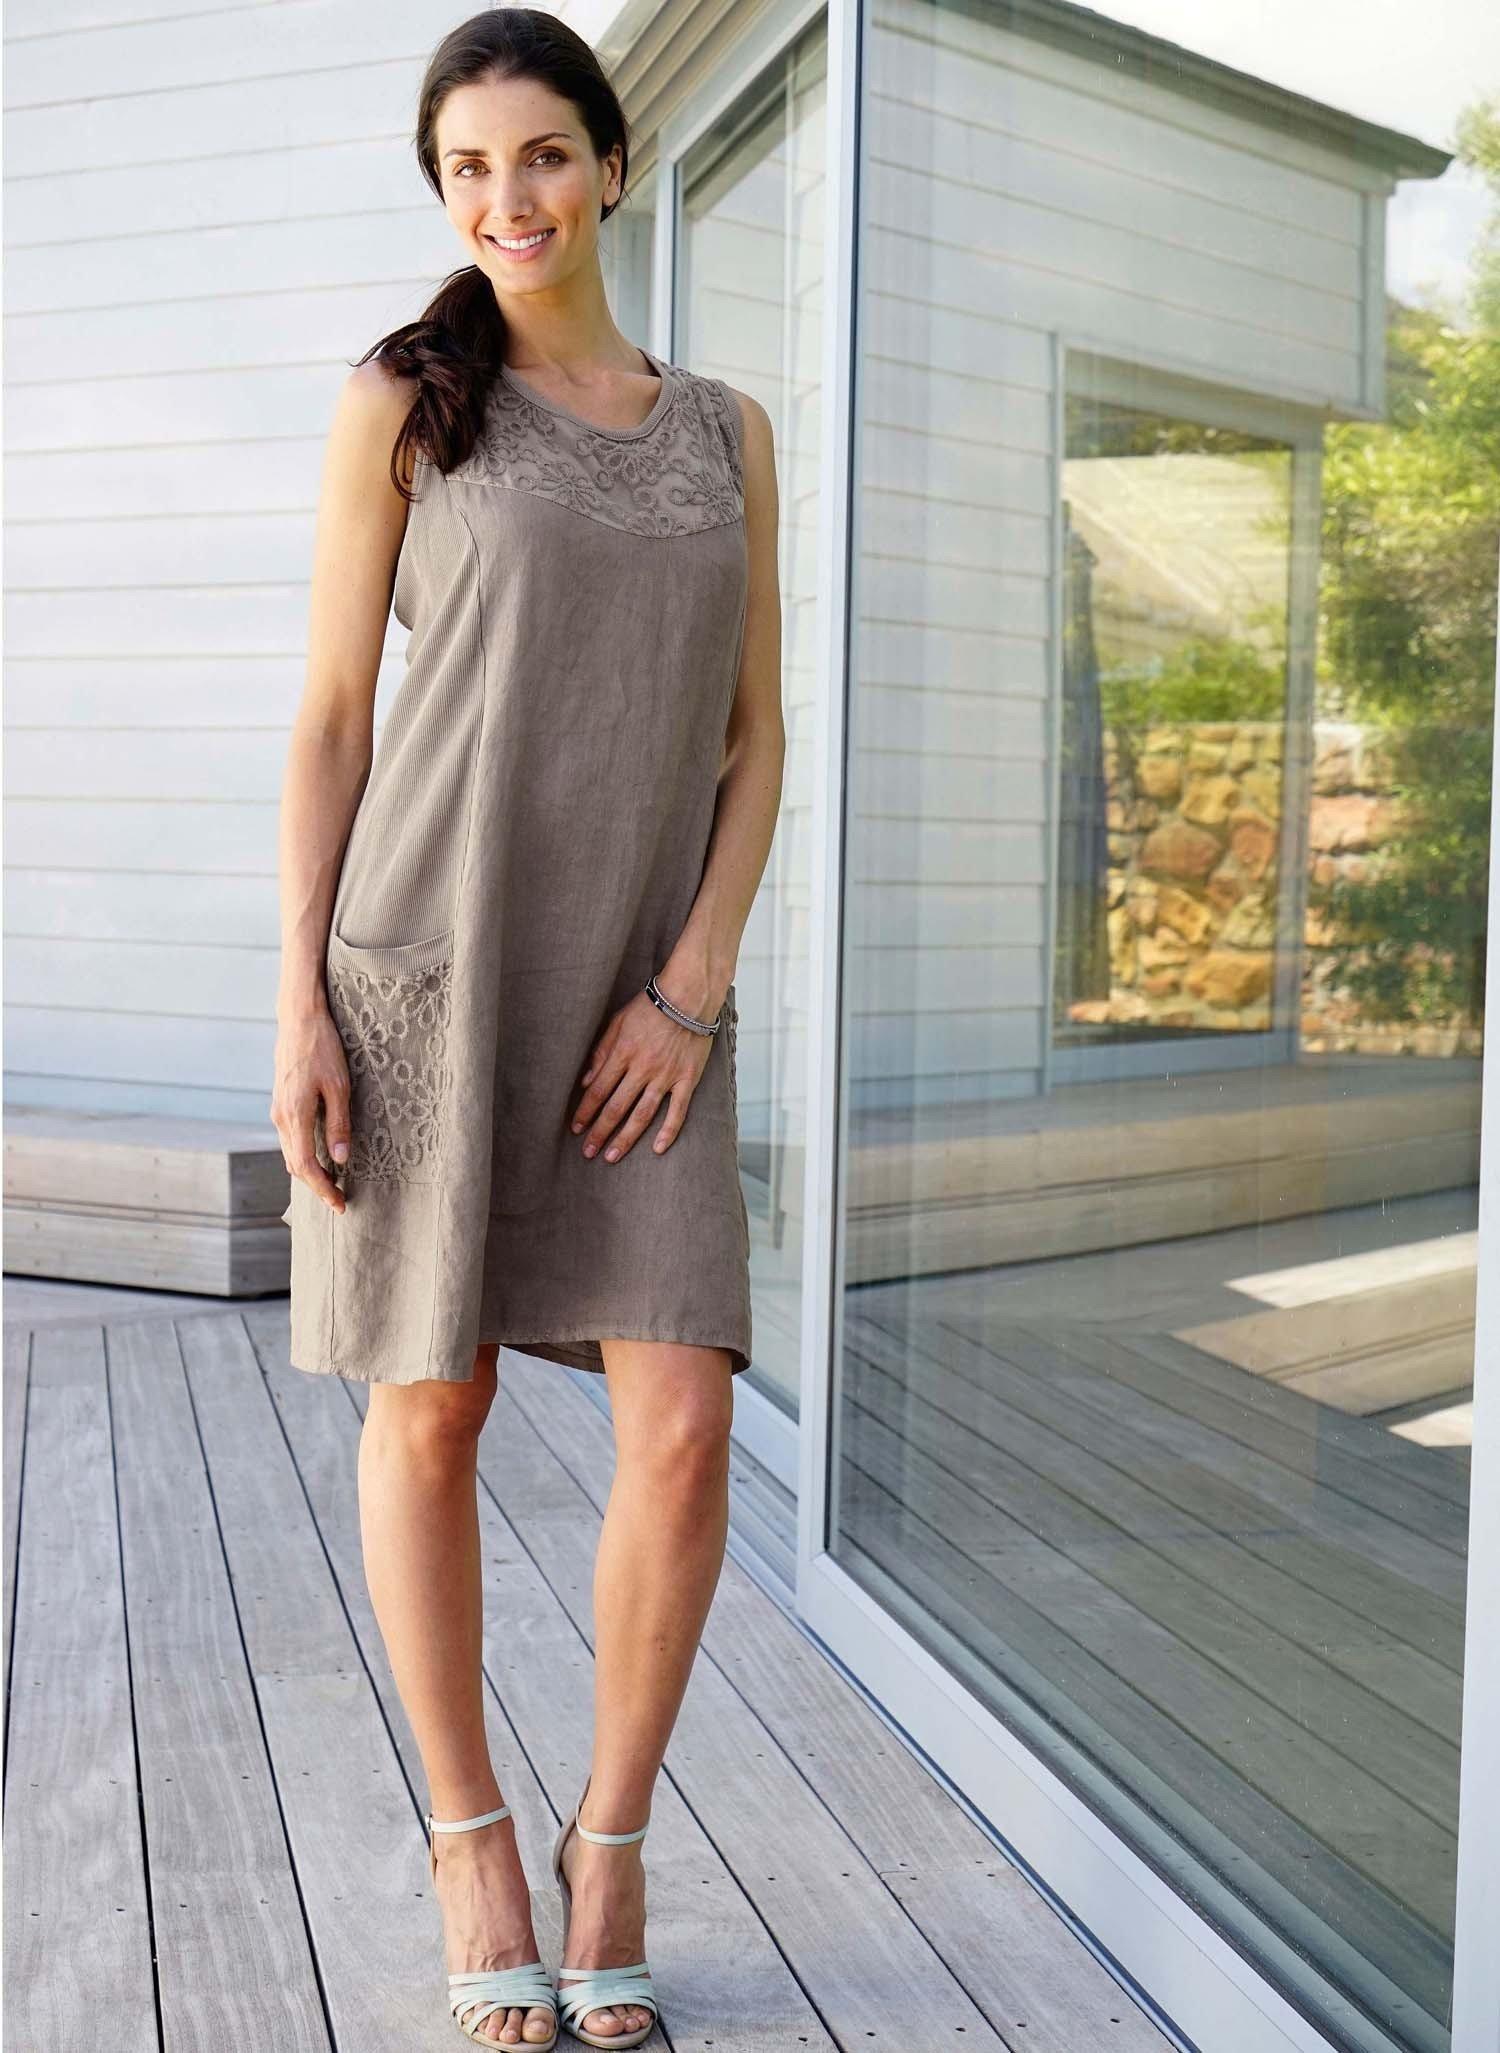 D-Leinen-Kleid,Floral taupe S 066 - 1 - Ronja.ch